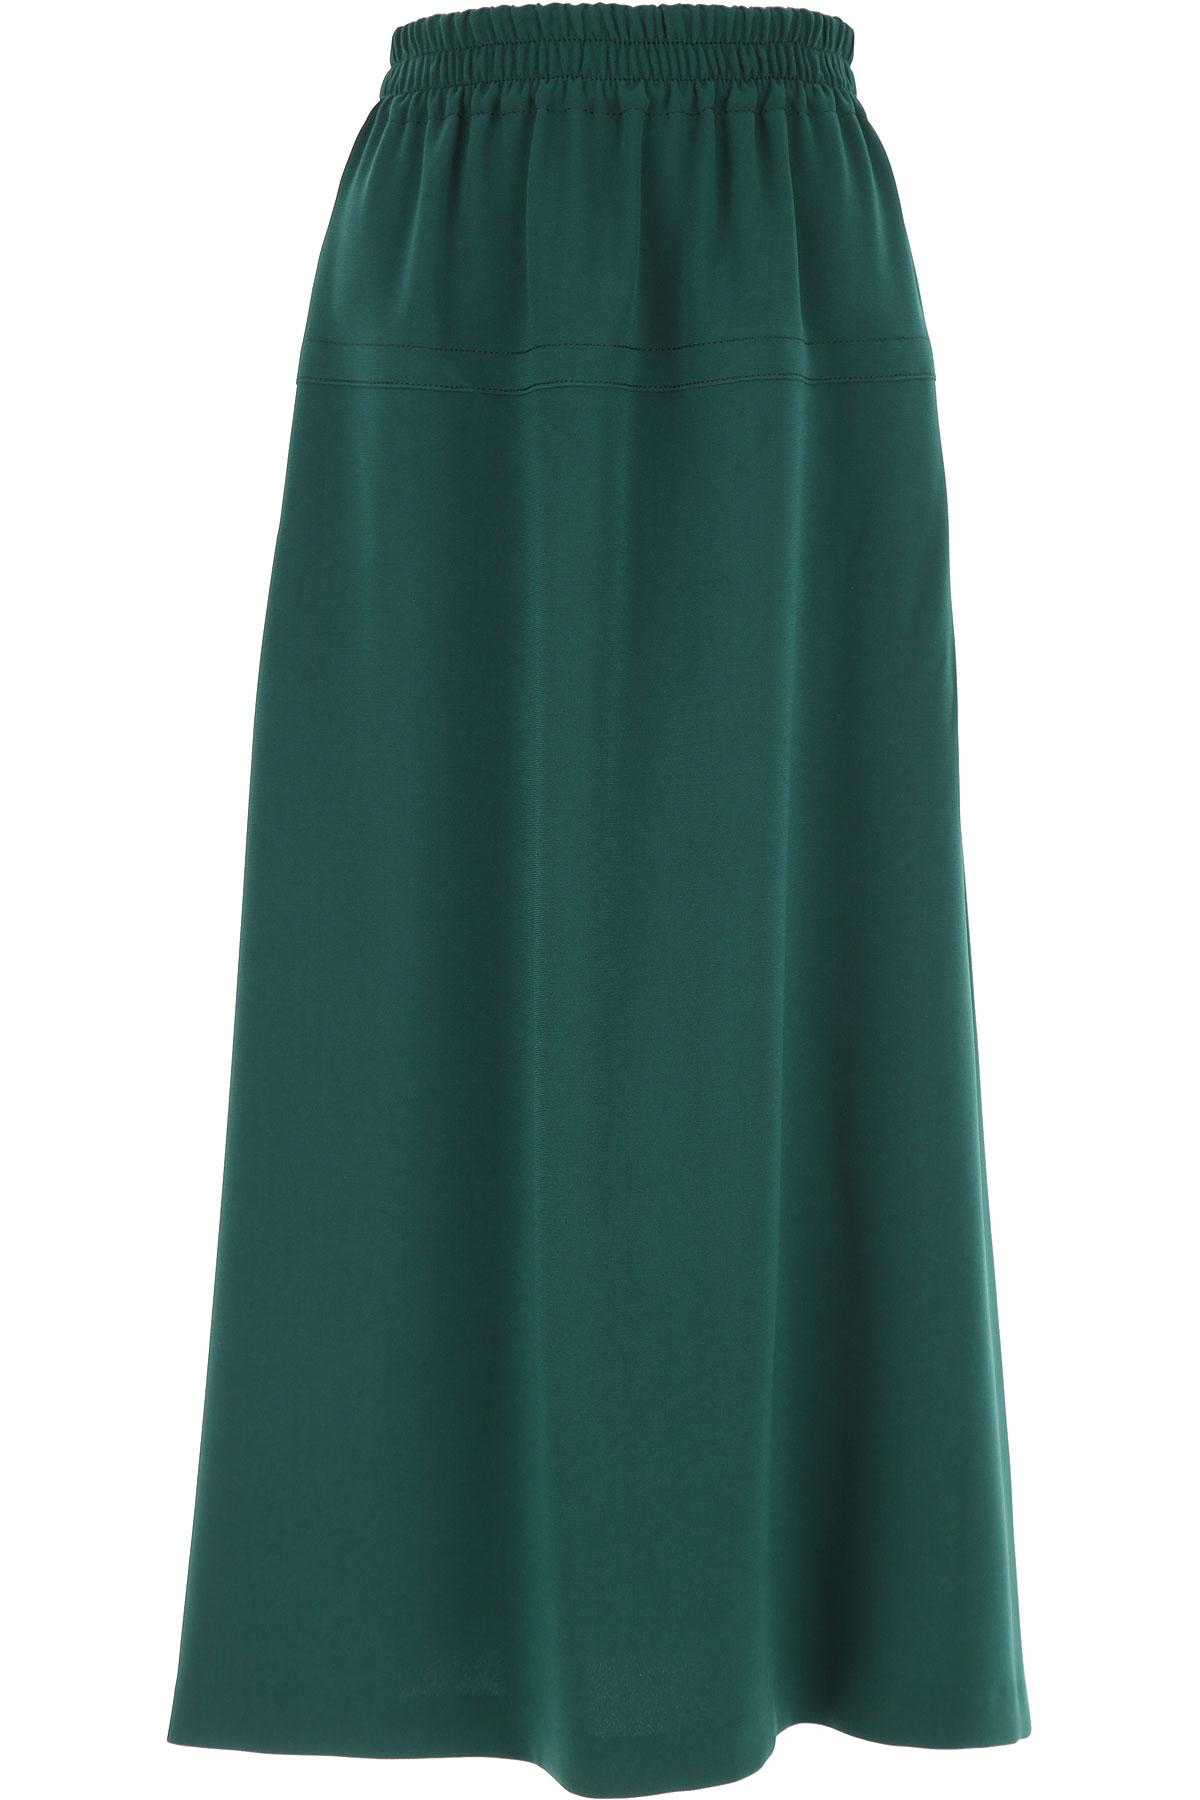 Alberto Biani Skirt for Women On Sale, Green, Triacetate, 2019, S (IT 40) M (IT 42 )